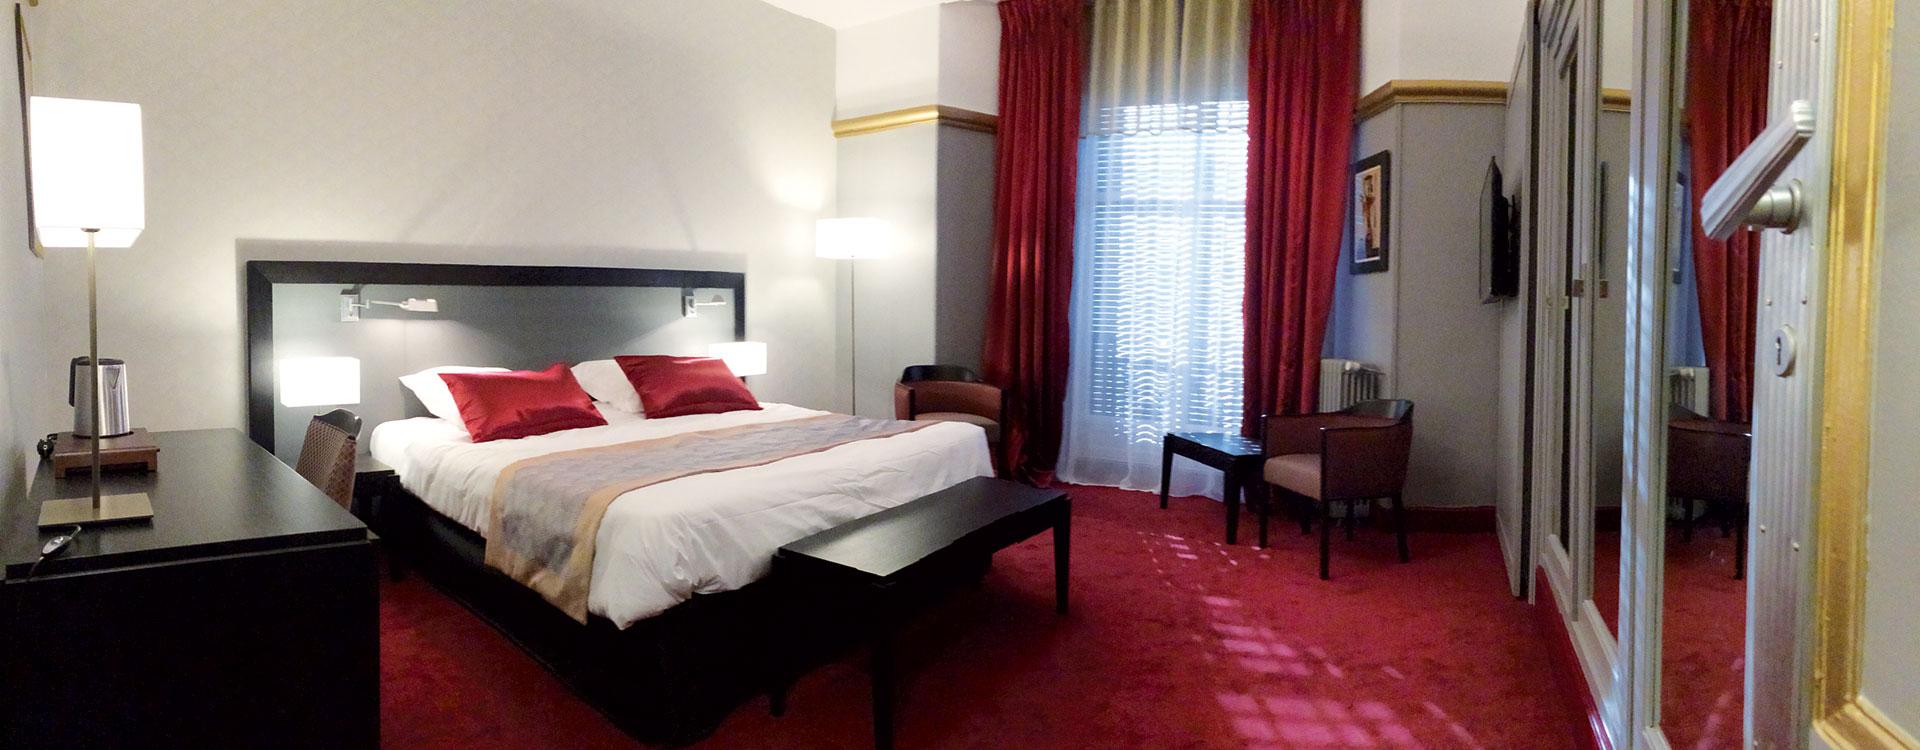 chambre single splendid